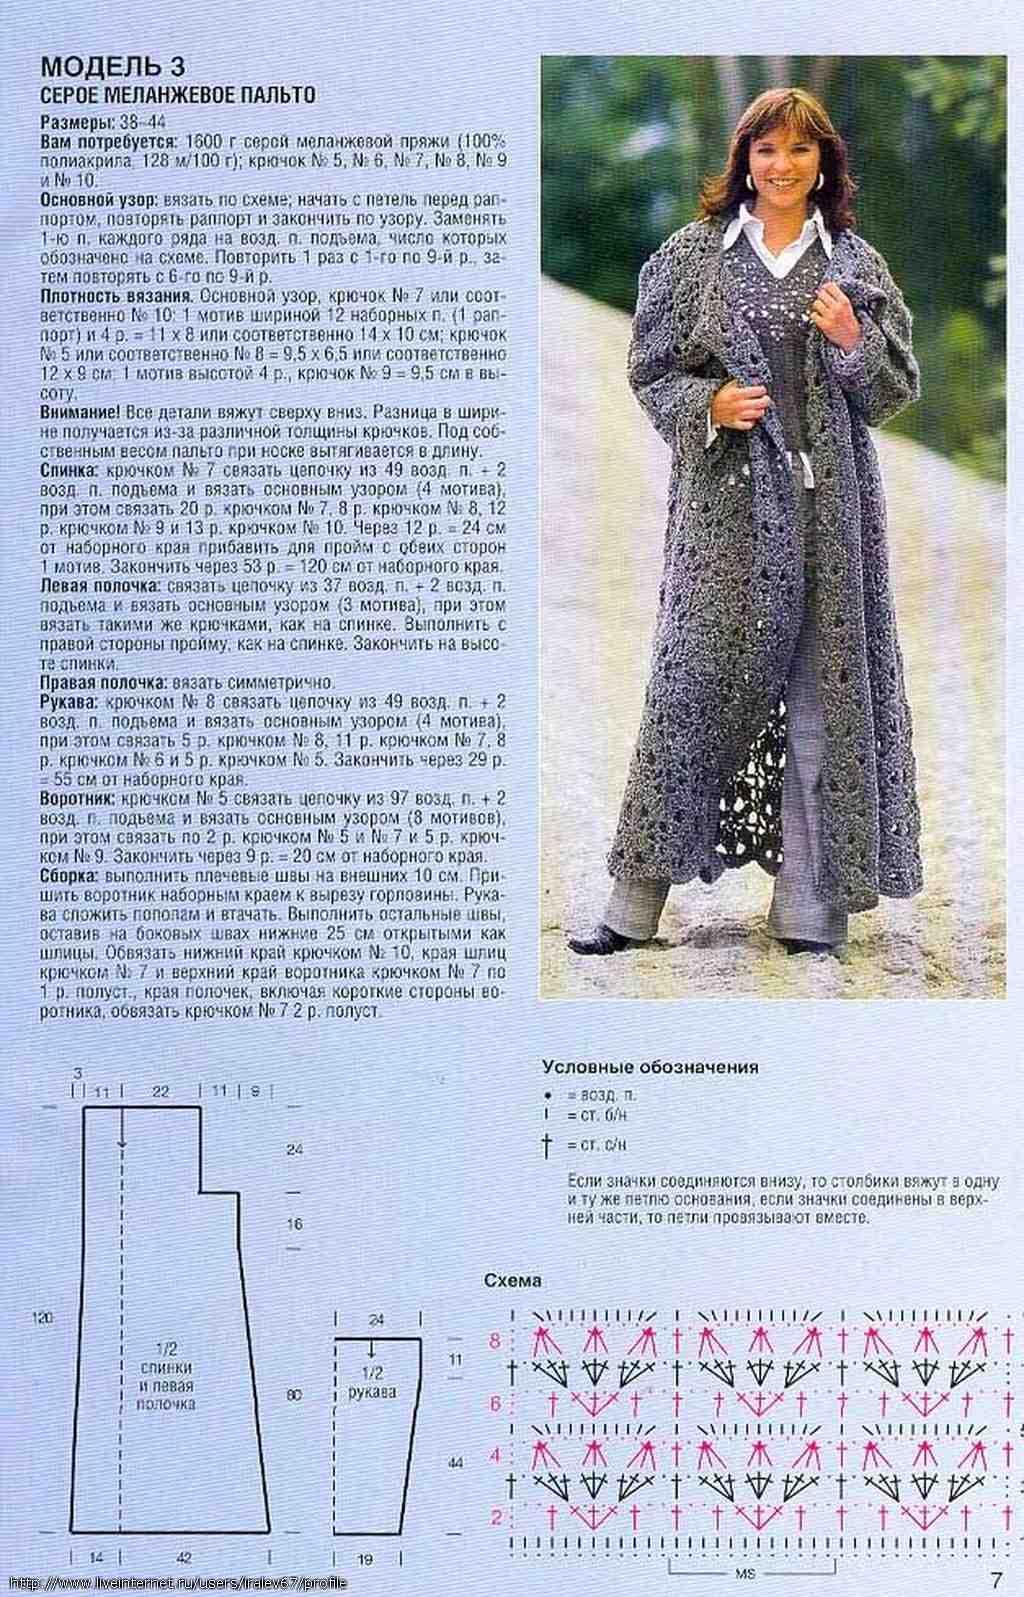 palto krjuchkom dlja zhenshhin 1 - Вязаное пальто крючком для женщин схемы и описание